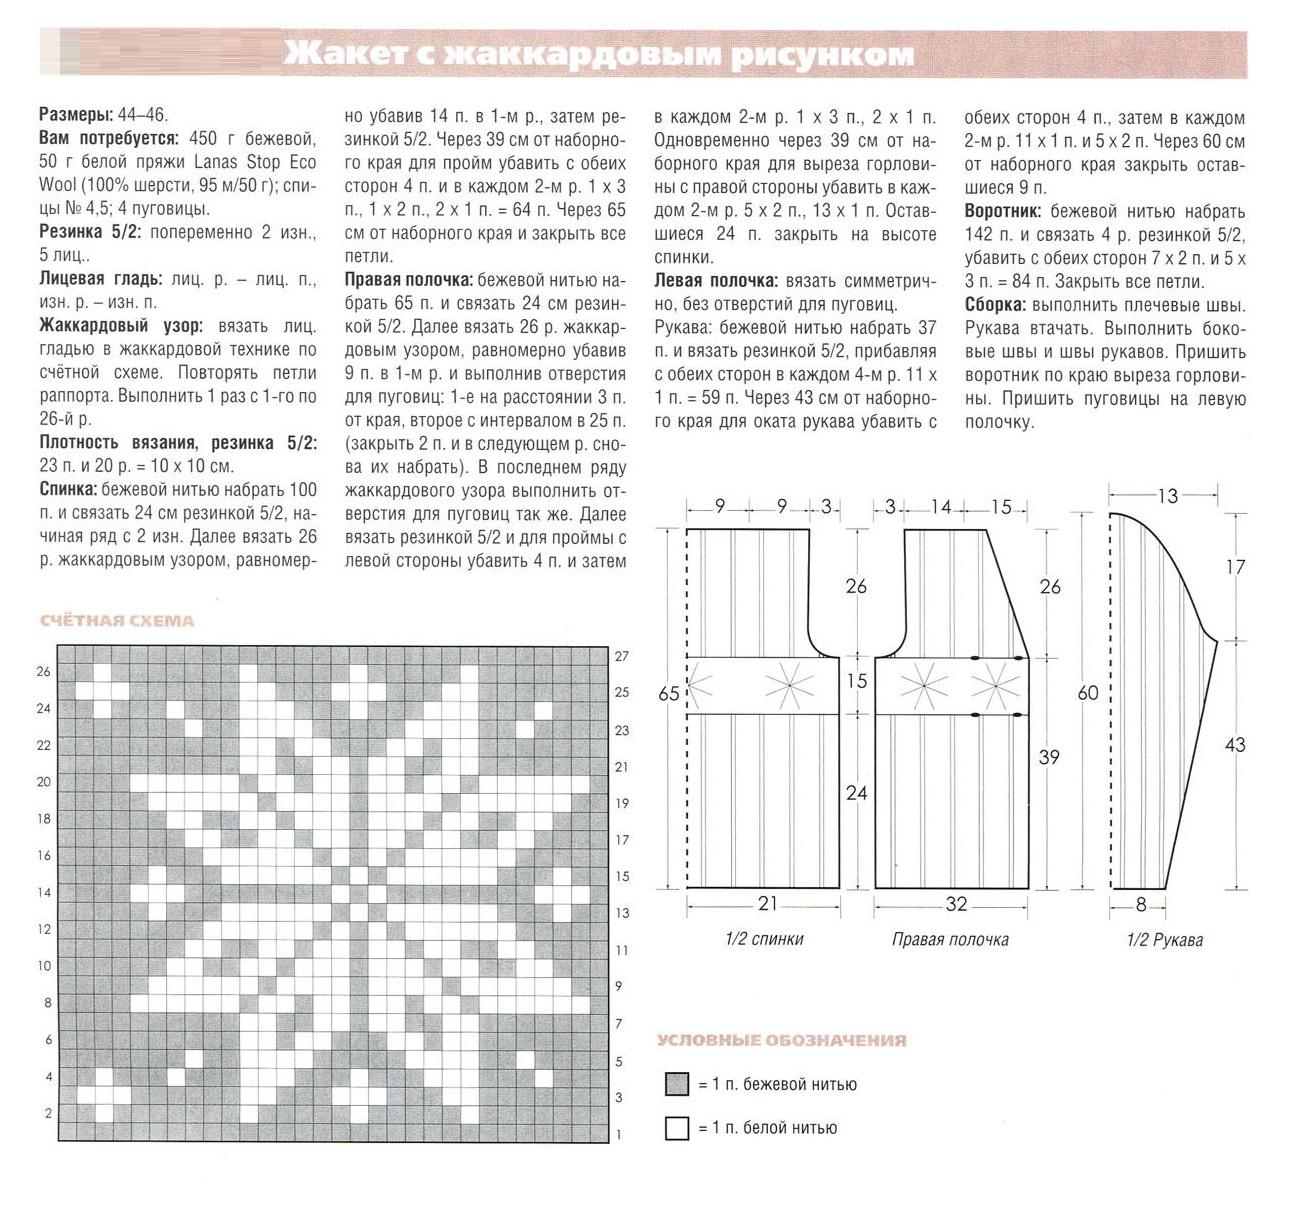 Технология вязания воротников